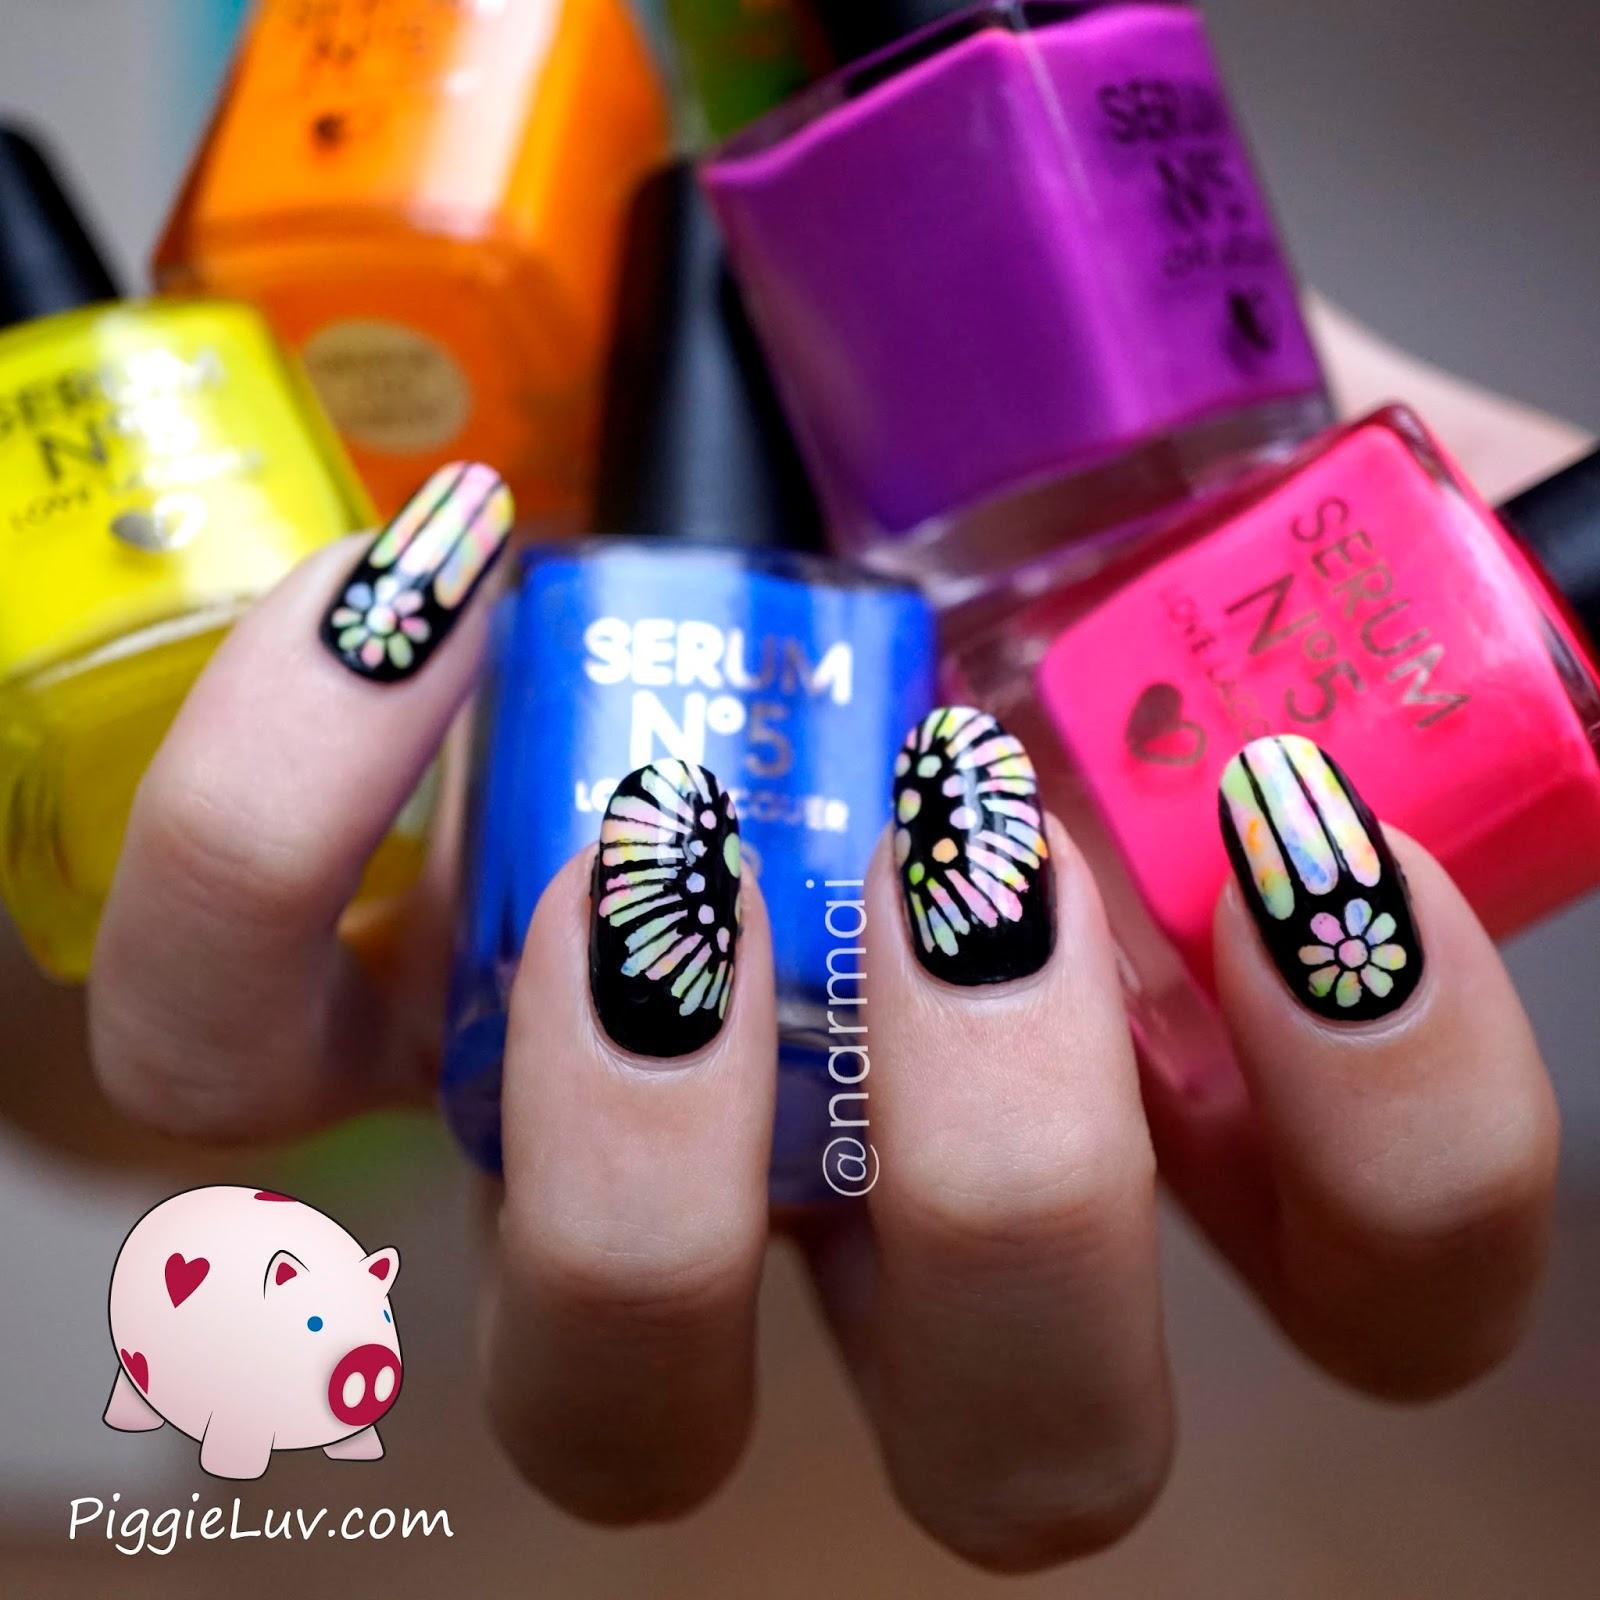 PiggieLuv: Glow in the dark rose window nail art